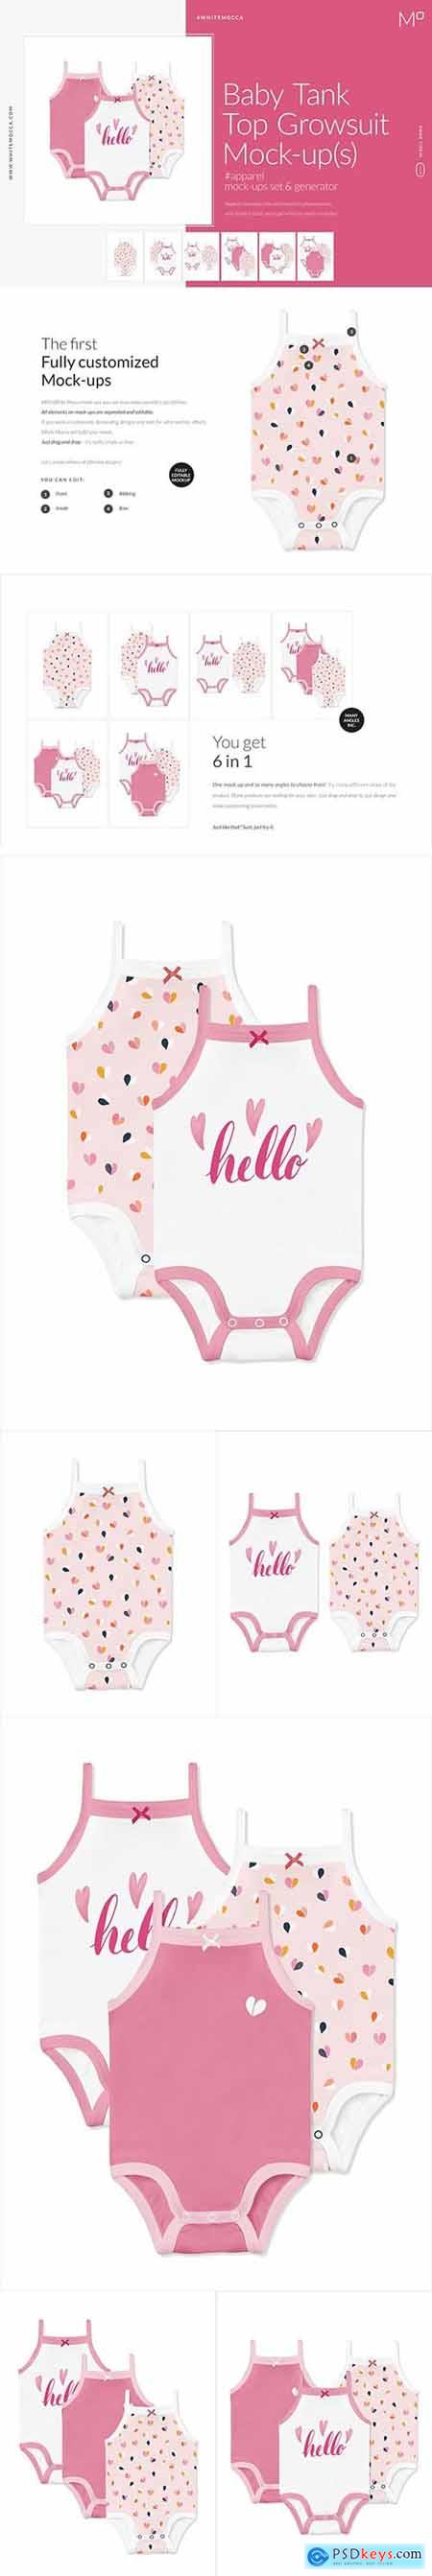 Baby Girl Tank Top Growsuit Mock-ups 4662244